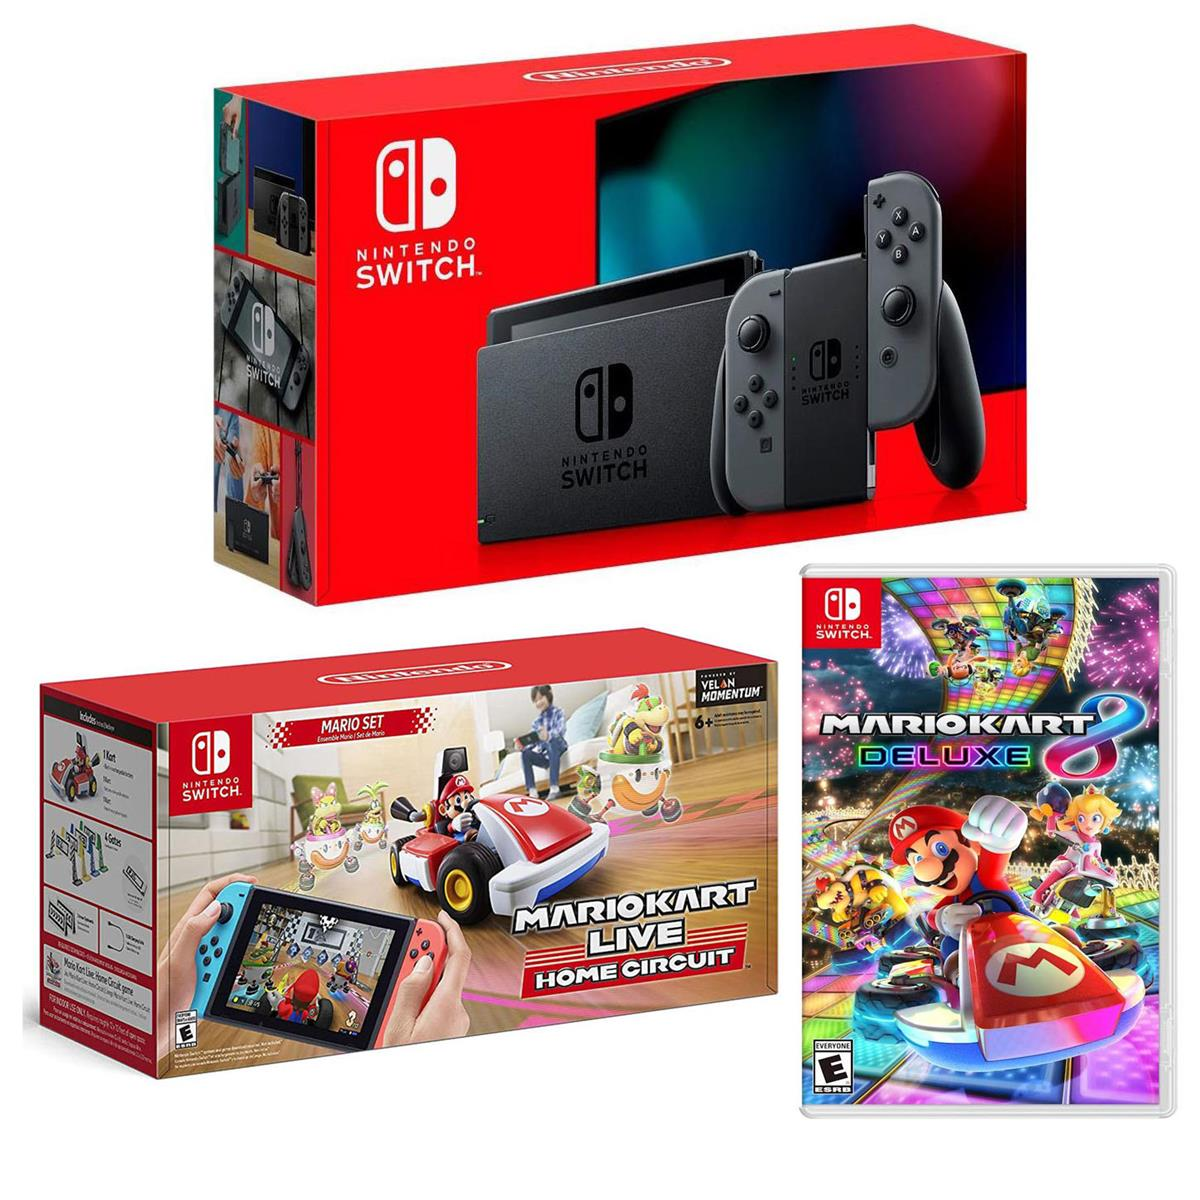 Nintendo 32GB Nintendo Switch with Gray Joy-Con Controllers - Bundle With Nintendo Mario Kart Live: Home Circuit, Mario Set Set for Nintendo Switch, Mario Kart 8 Deluxe for Nintendo Switch